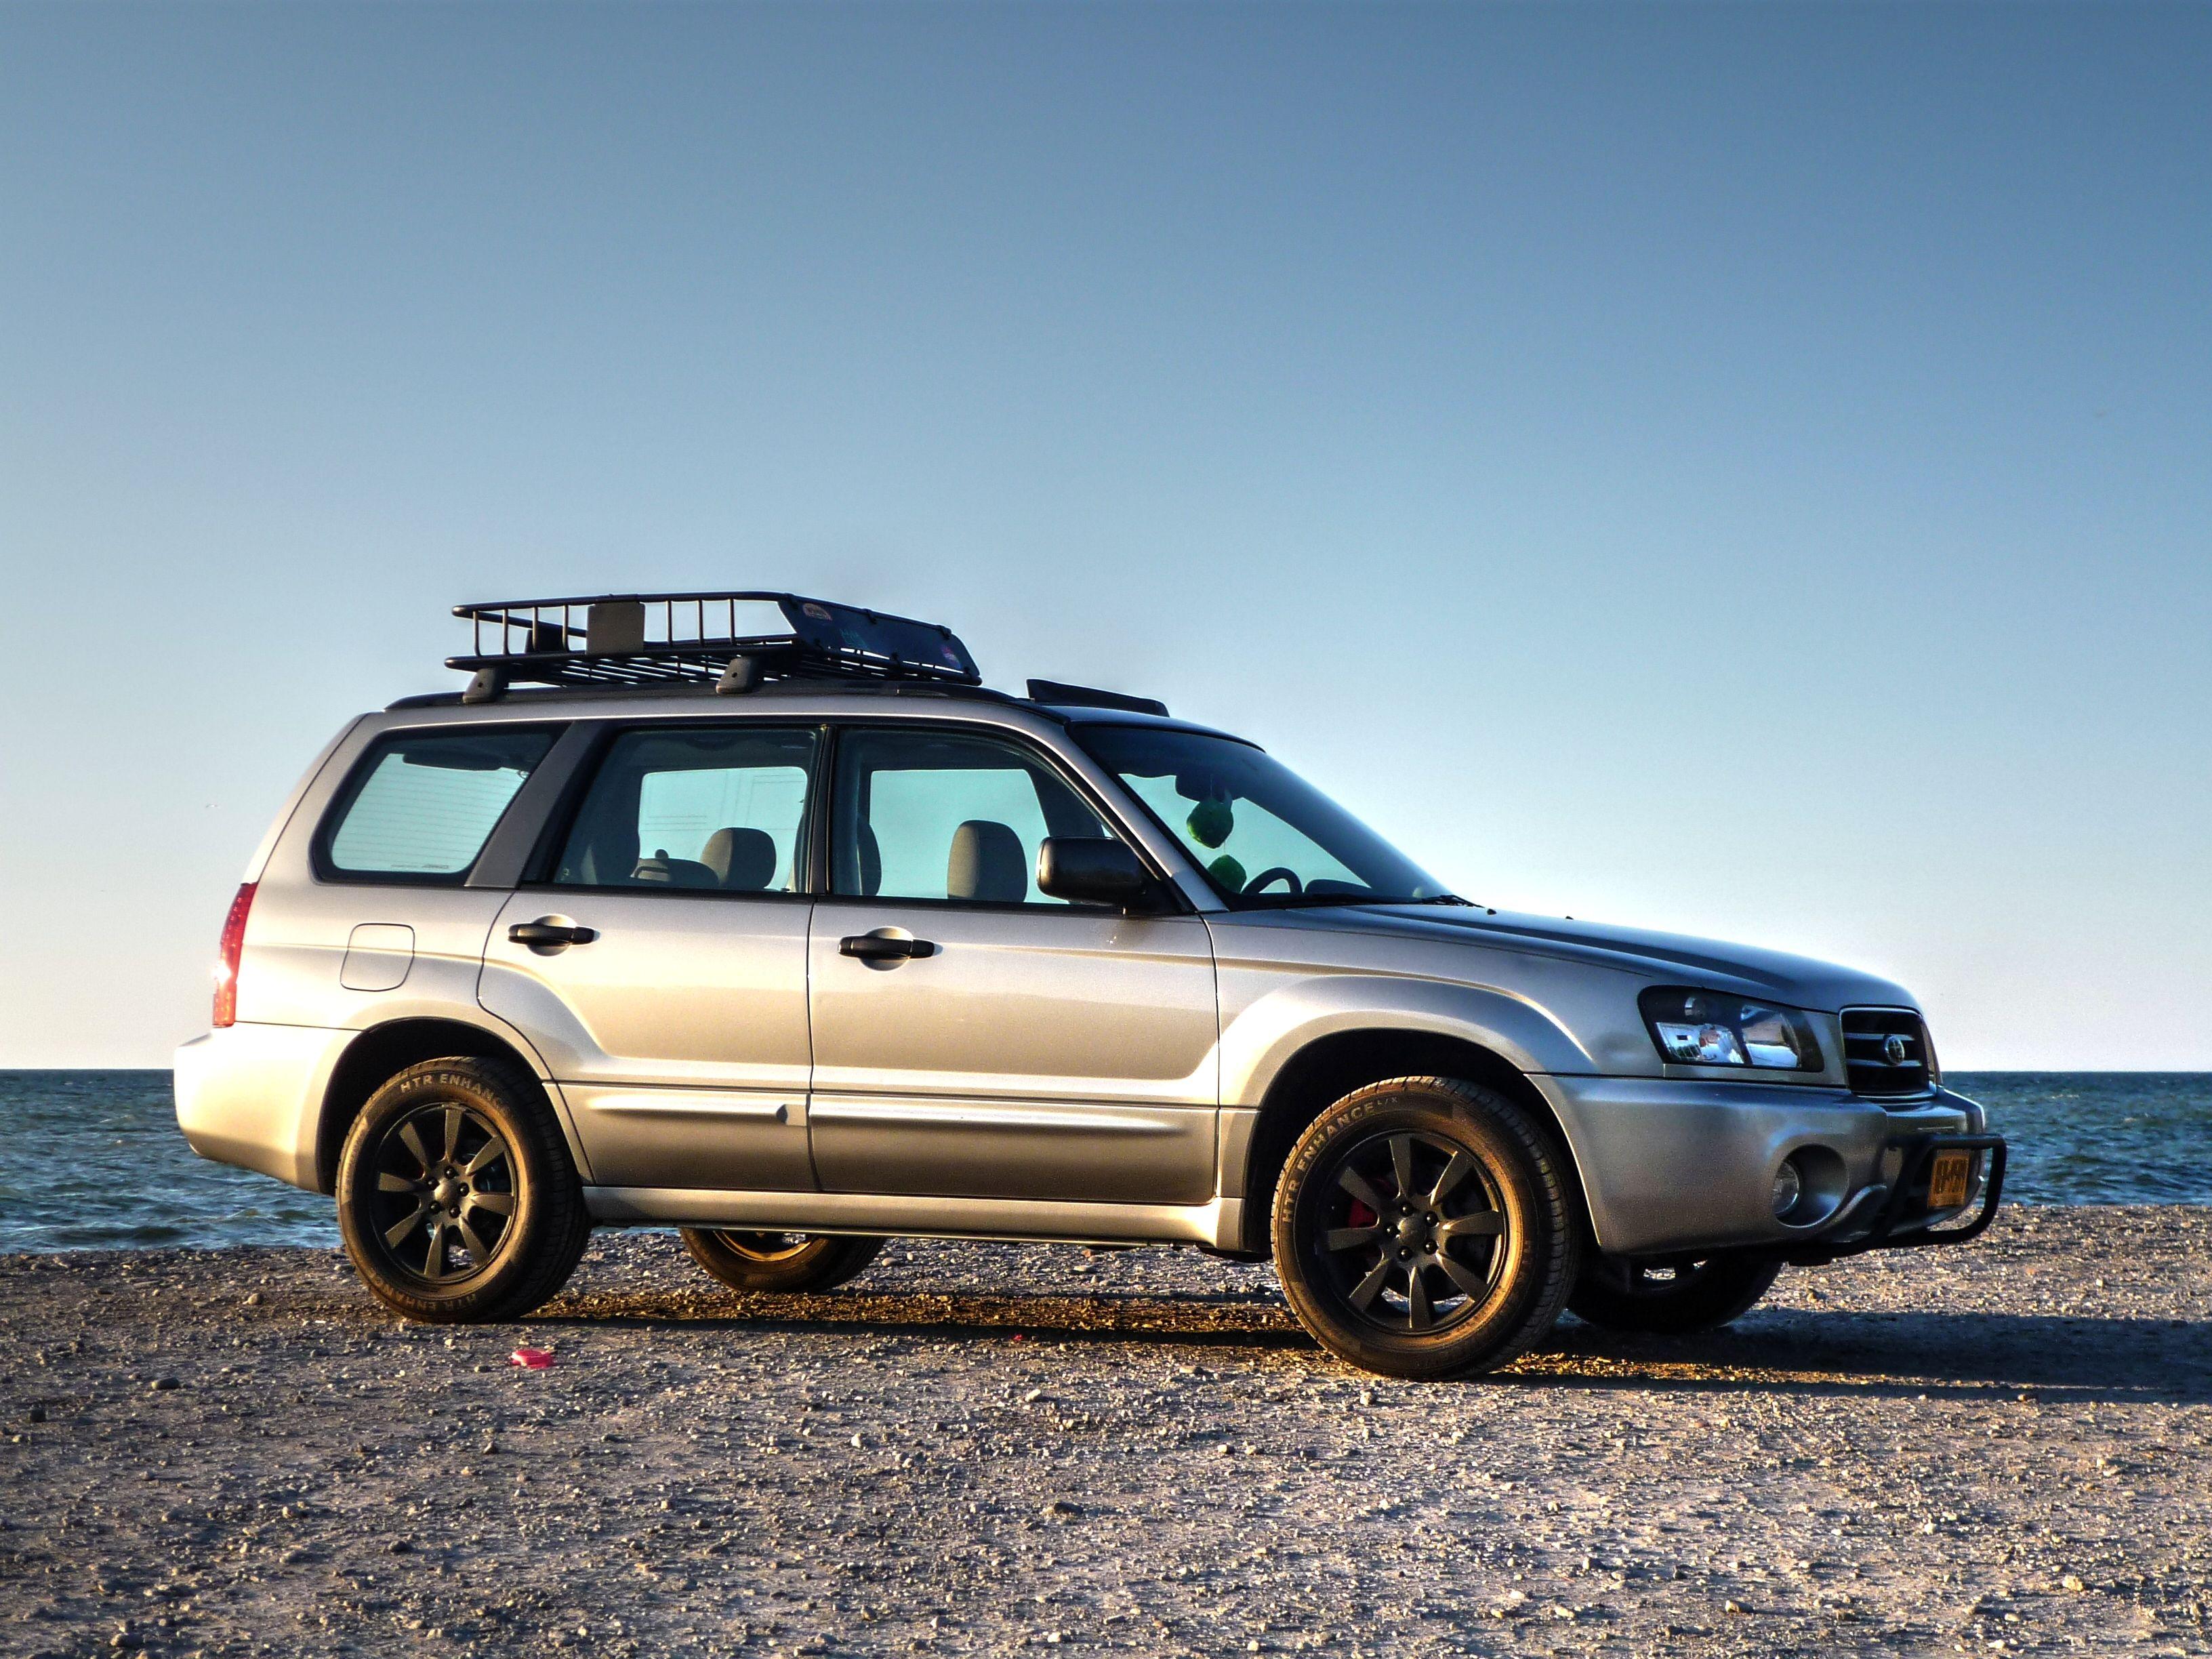 Pin on Subaru, Outback, Forester, WRX, STI, Impreza,